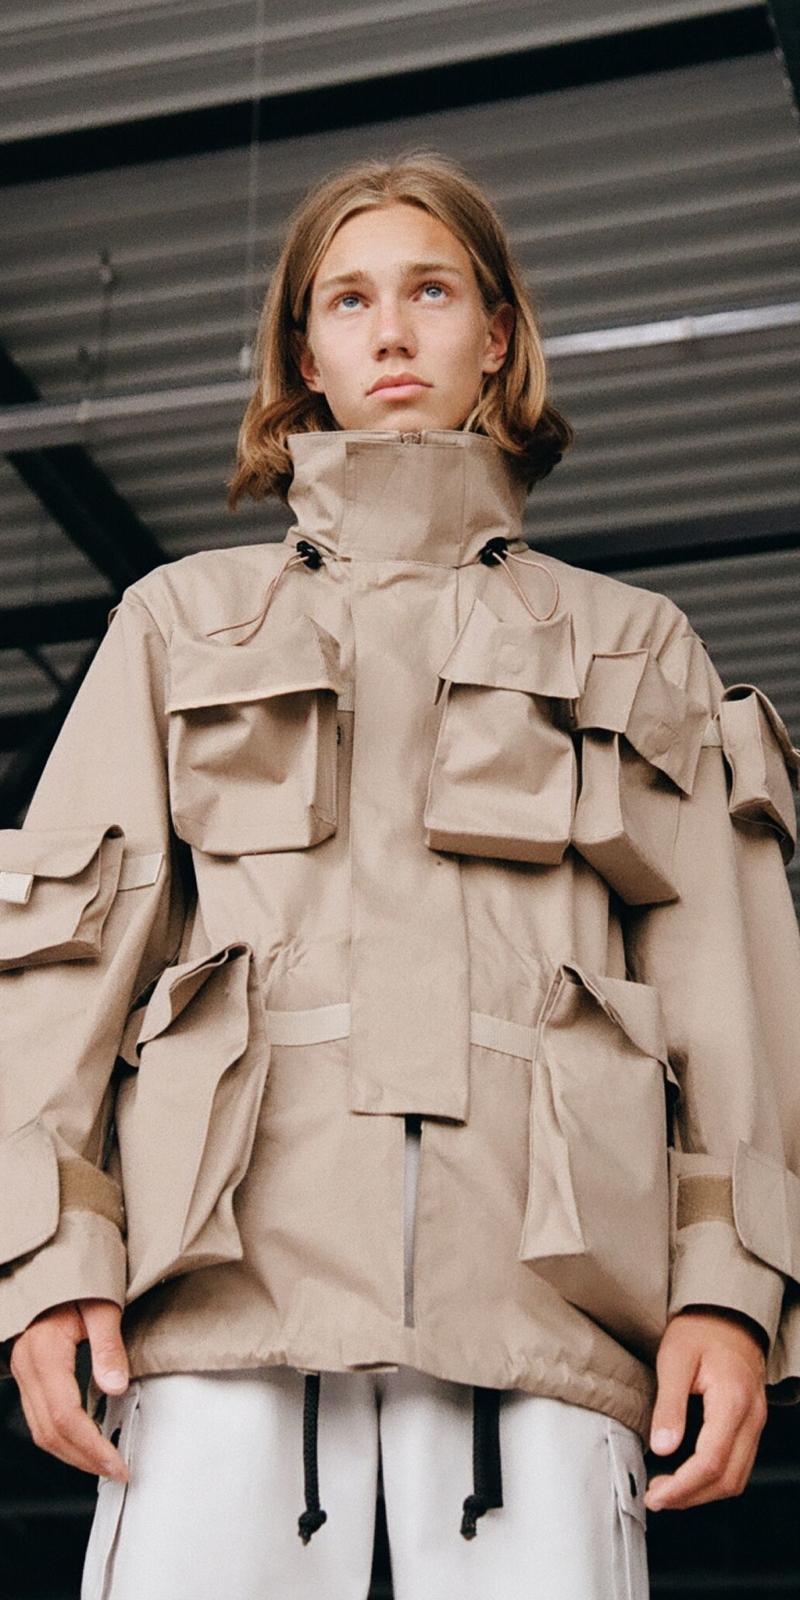 Куртка изколлекции Liniya Pobeda